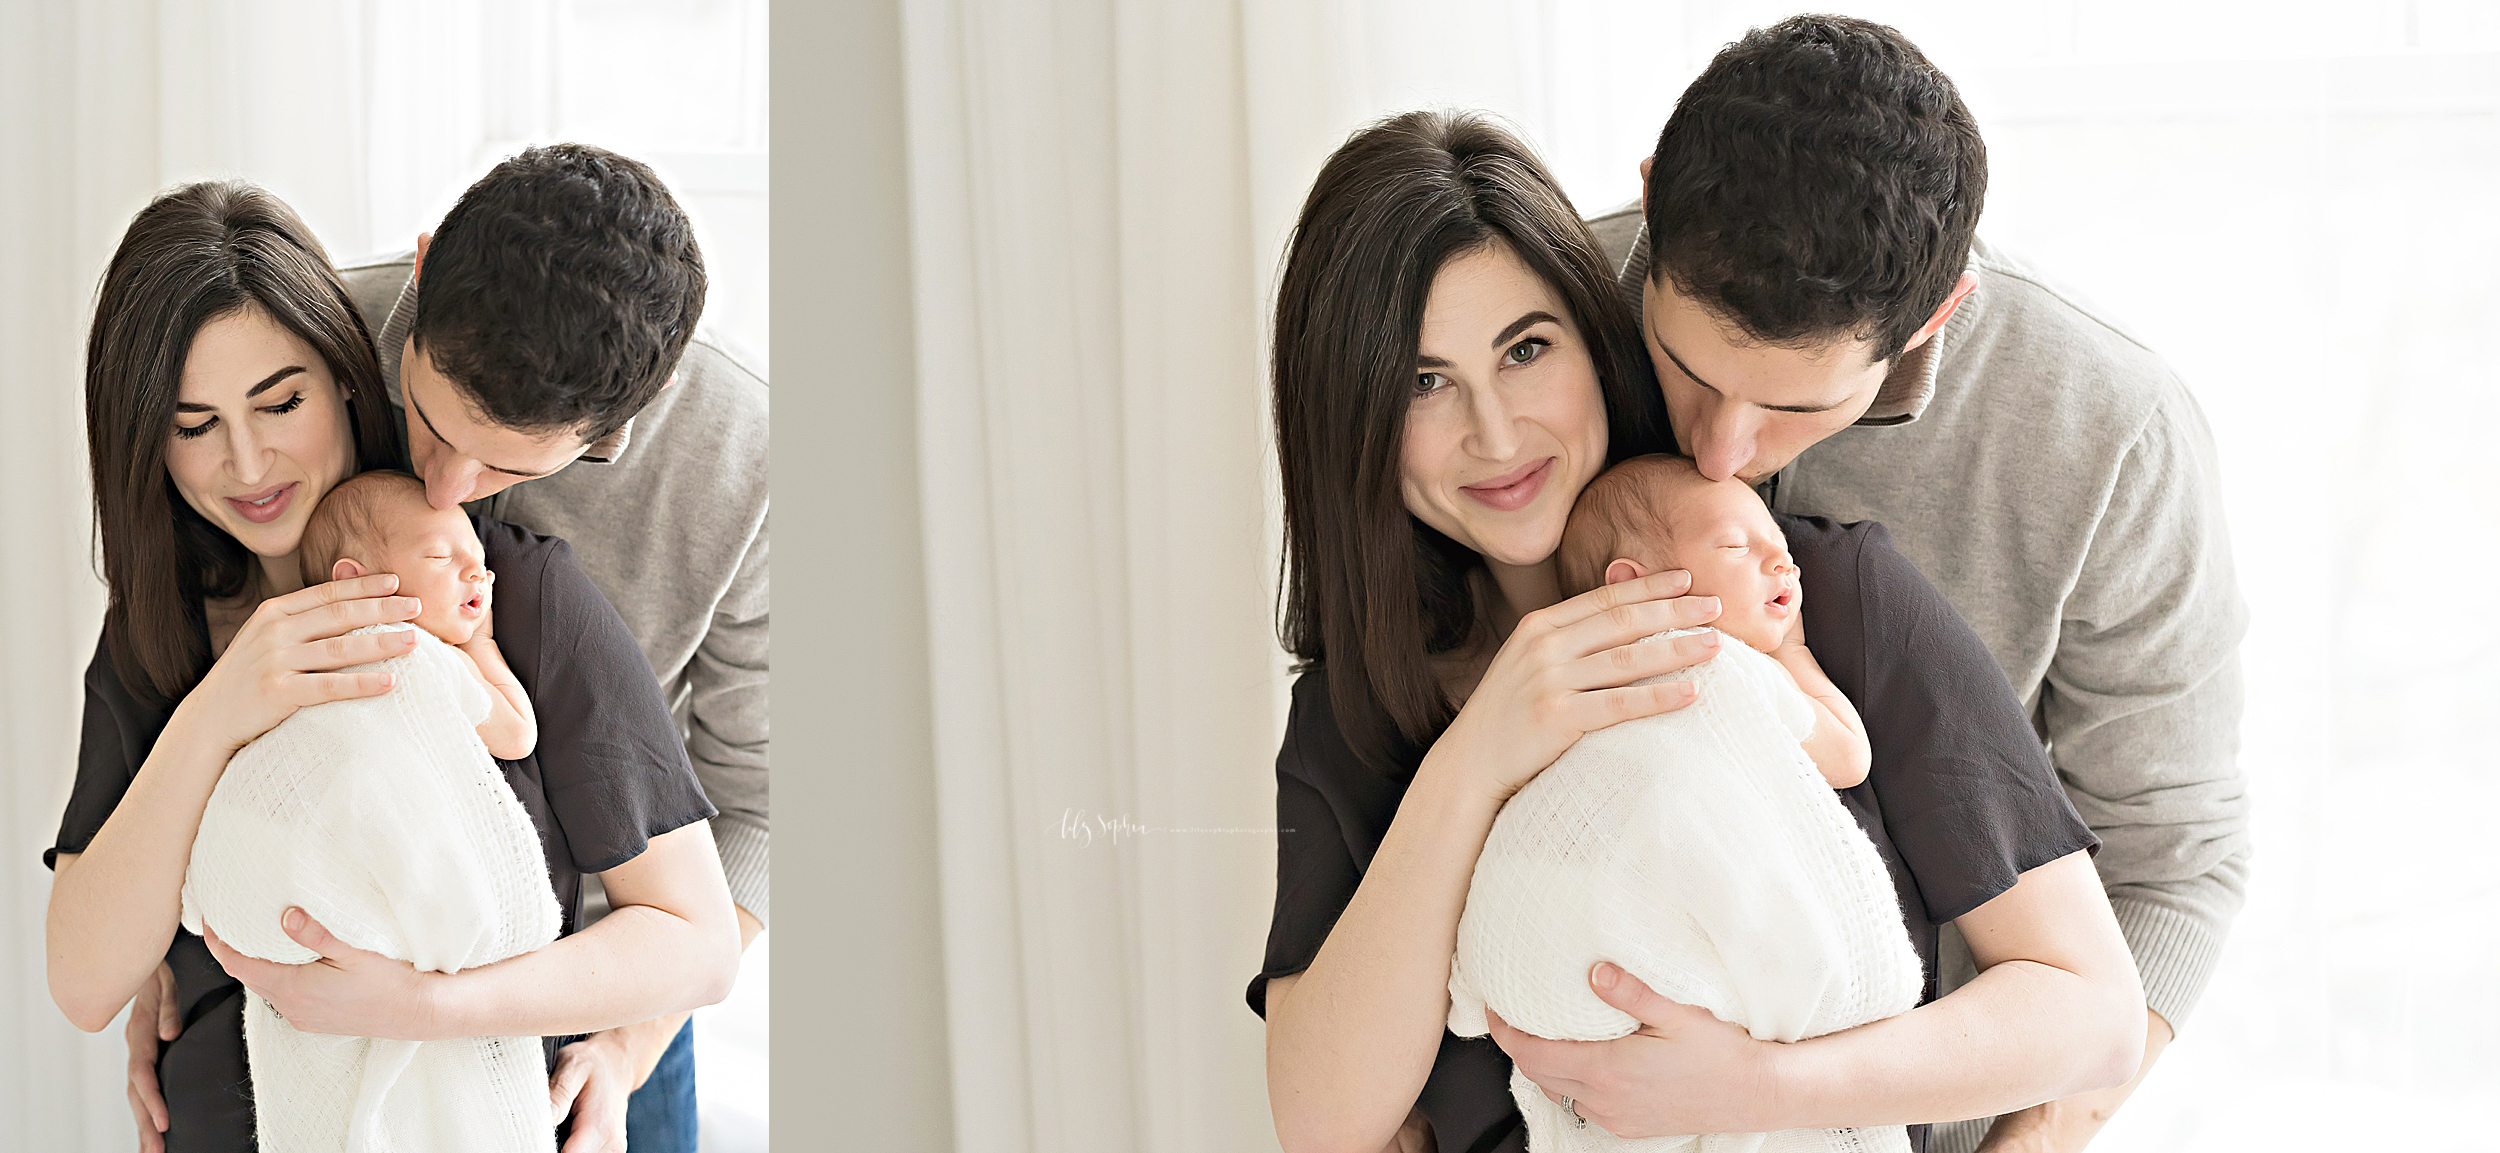 atlanta-midtown-atlantic-station-virginia-highlands-roswell-decatur-lily-sophia-photography-newborn-baby-boy-new-parents-studio-session_0554.jpg